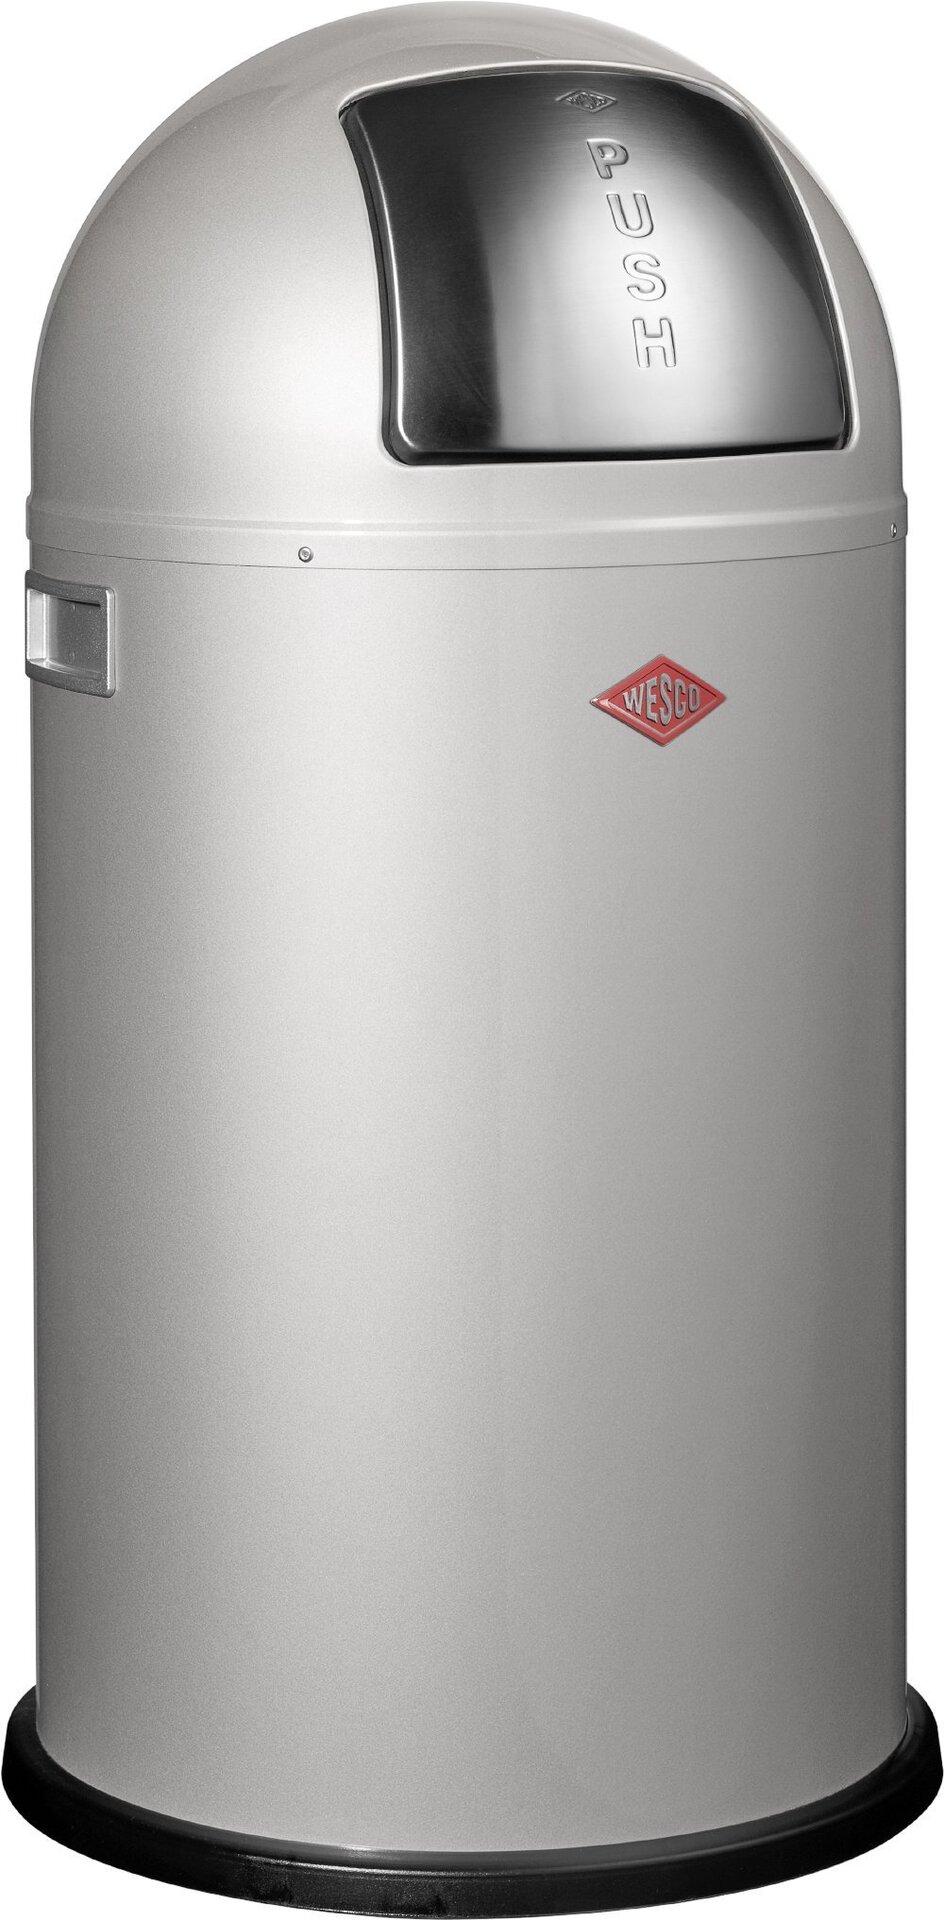 Müllbehälter Pushboy Wesco Metall silber